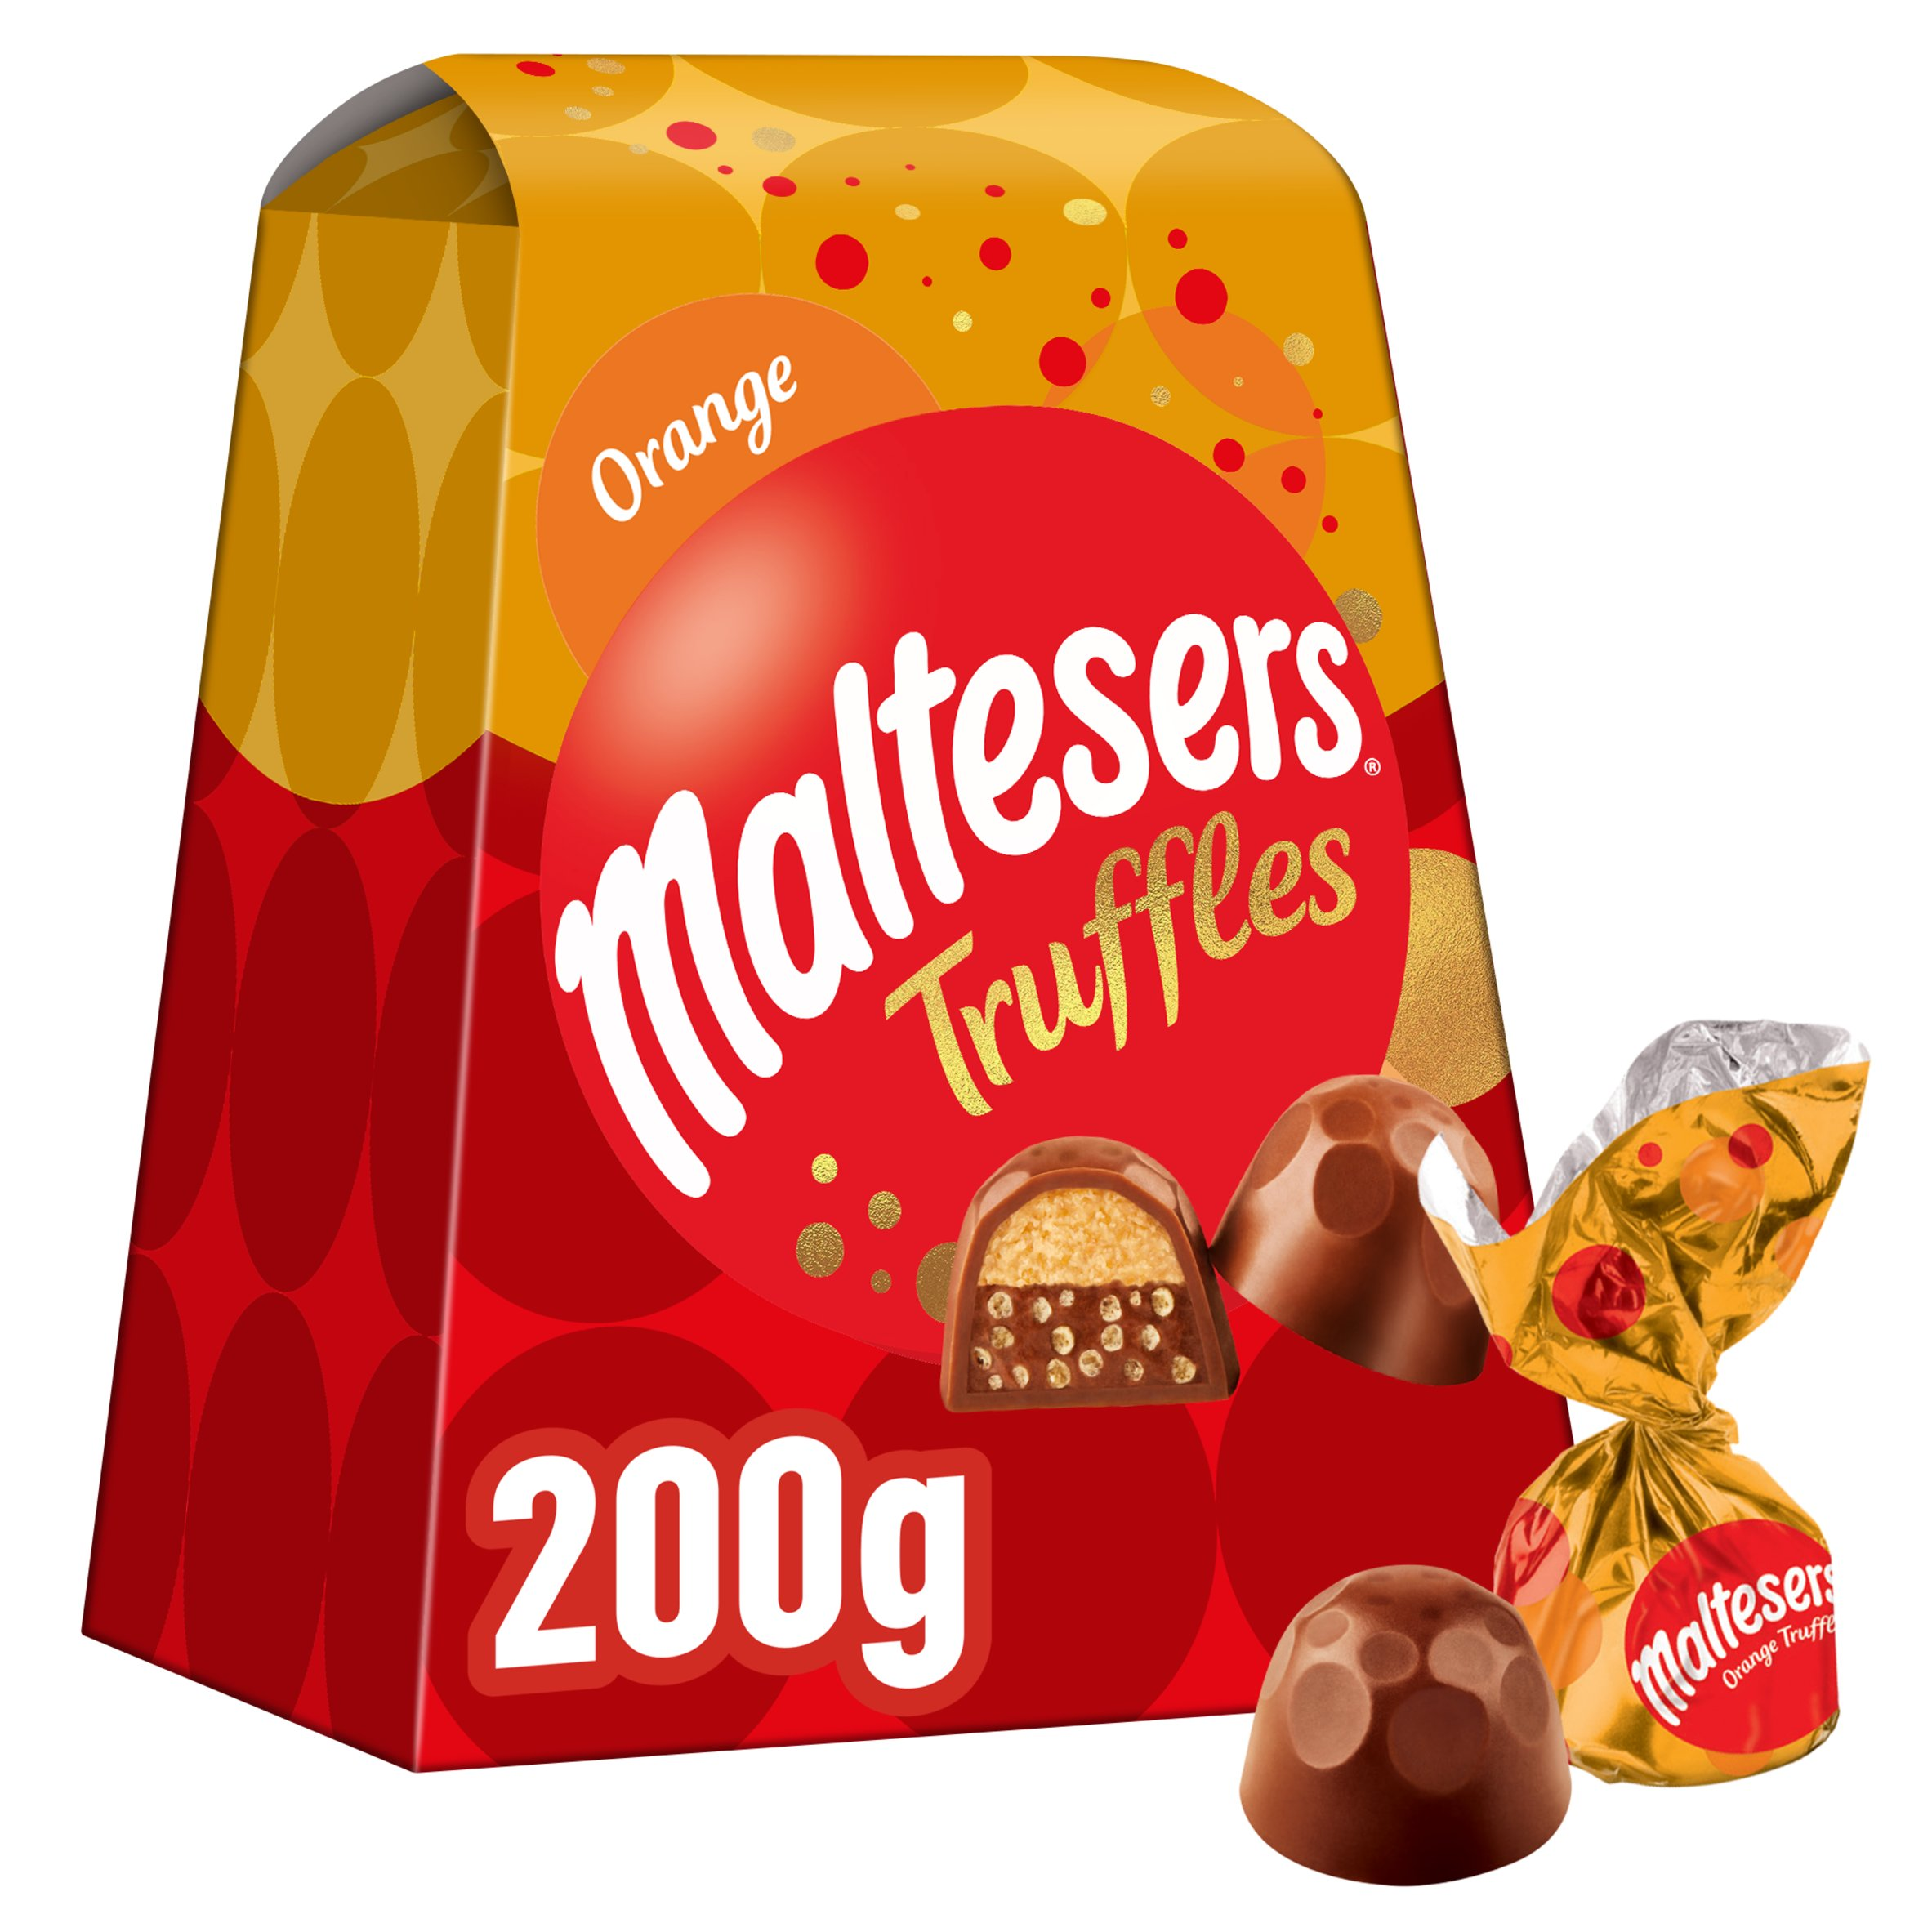 Maltesers Orange Truffles Gift Box 200G